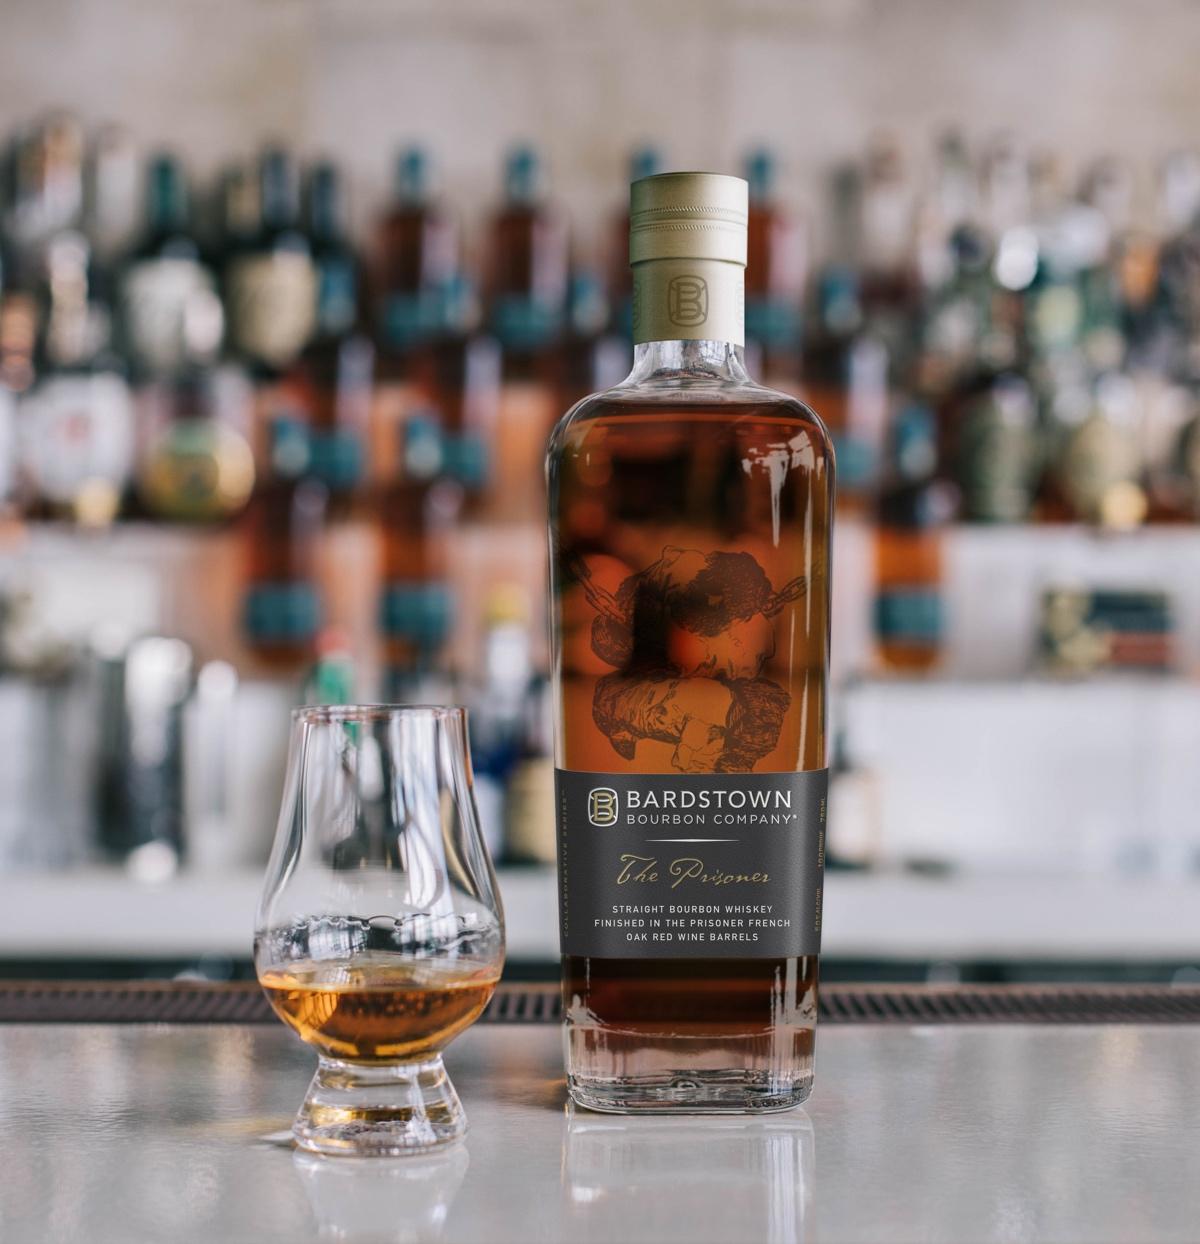 Bardstown Bourbon Company The Prisoner Wine Company Collaboration Bottle